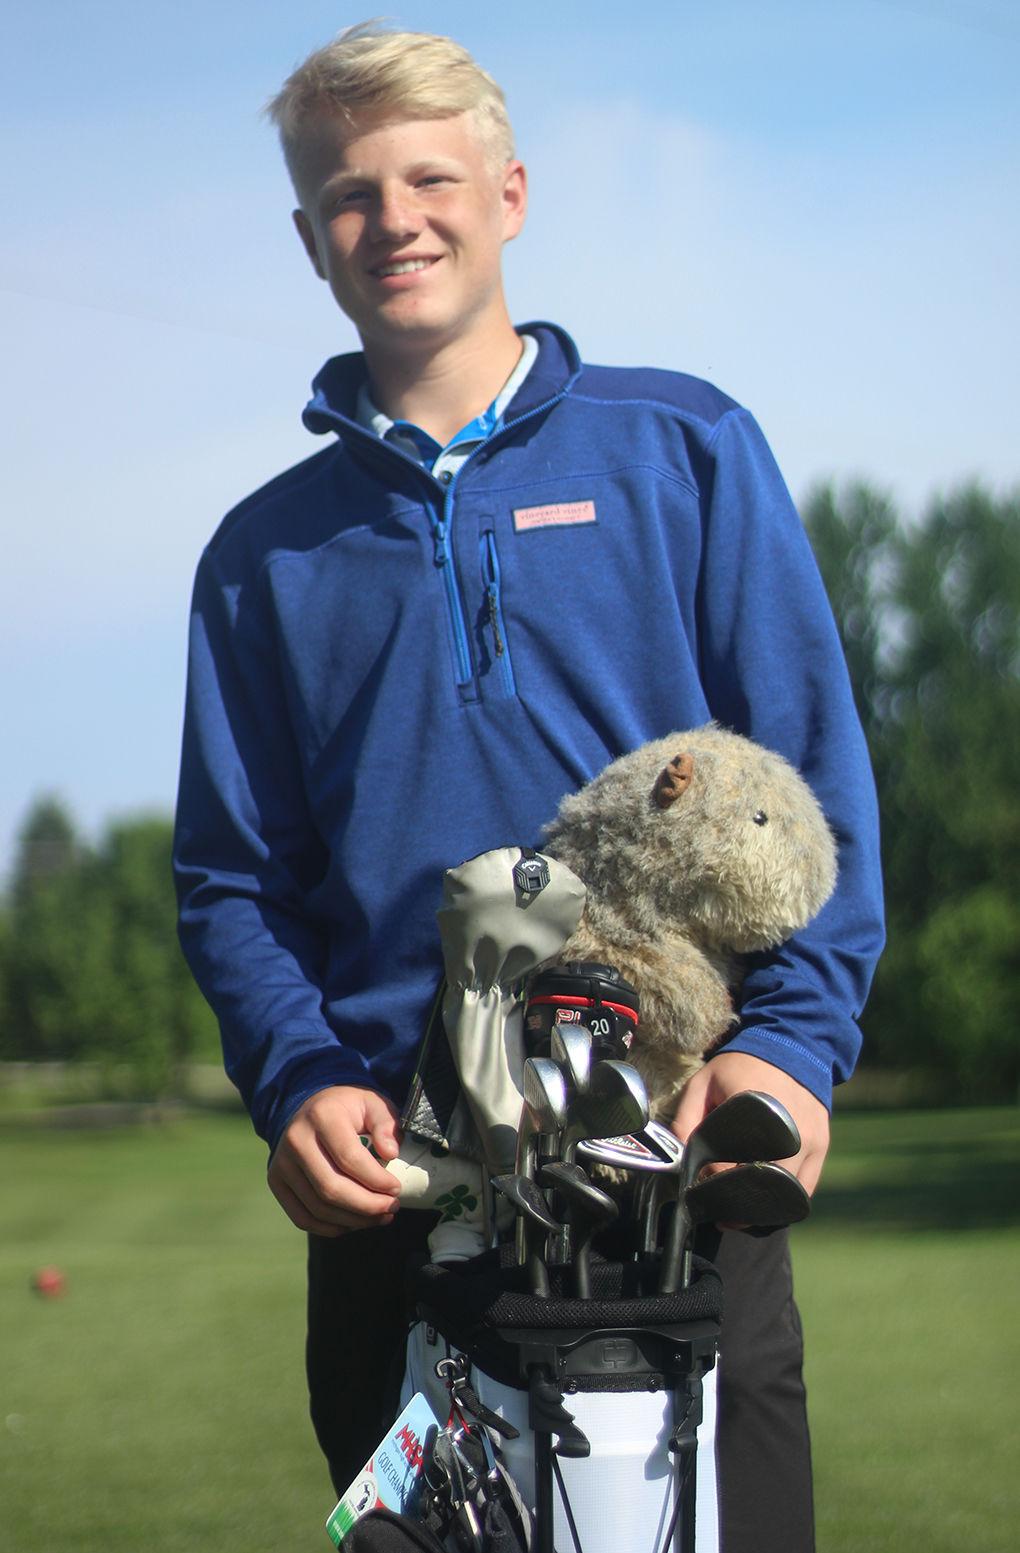 ALL-AREA GOLF: Super Sophomore— Laingsburg's Zach Koerner named Golfer of the Year